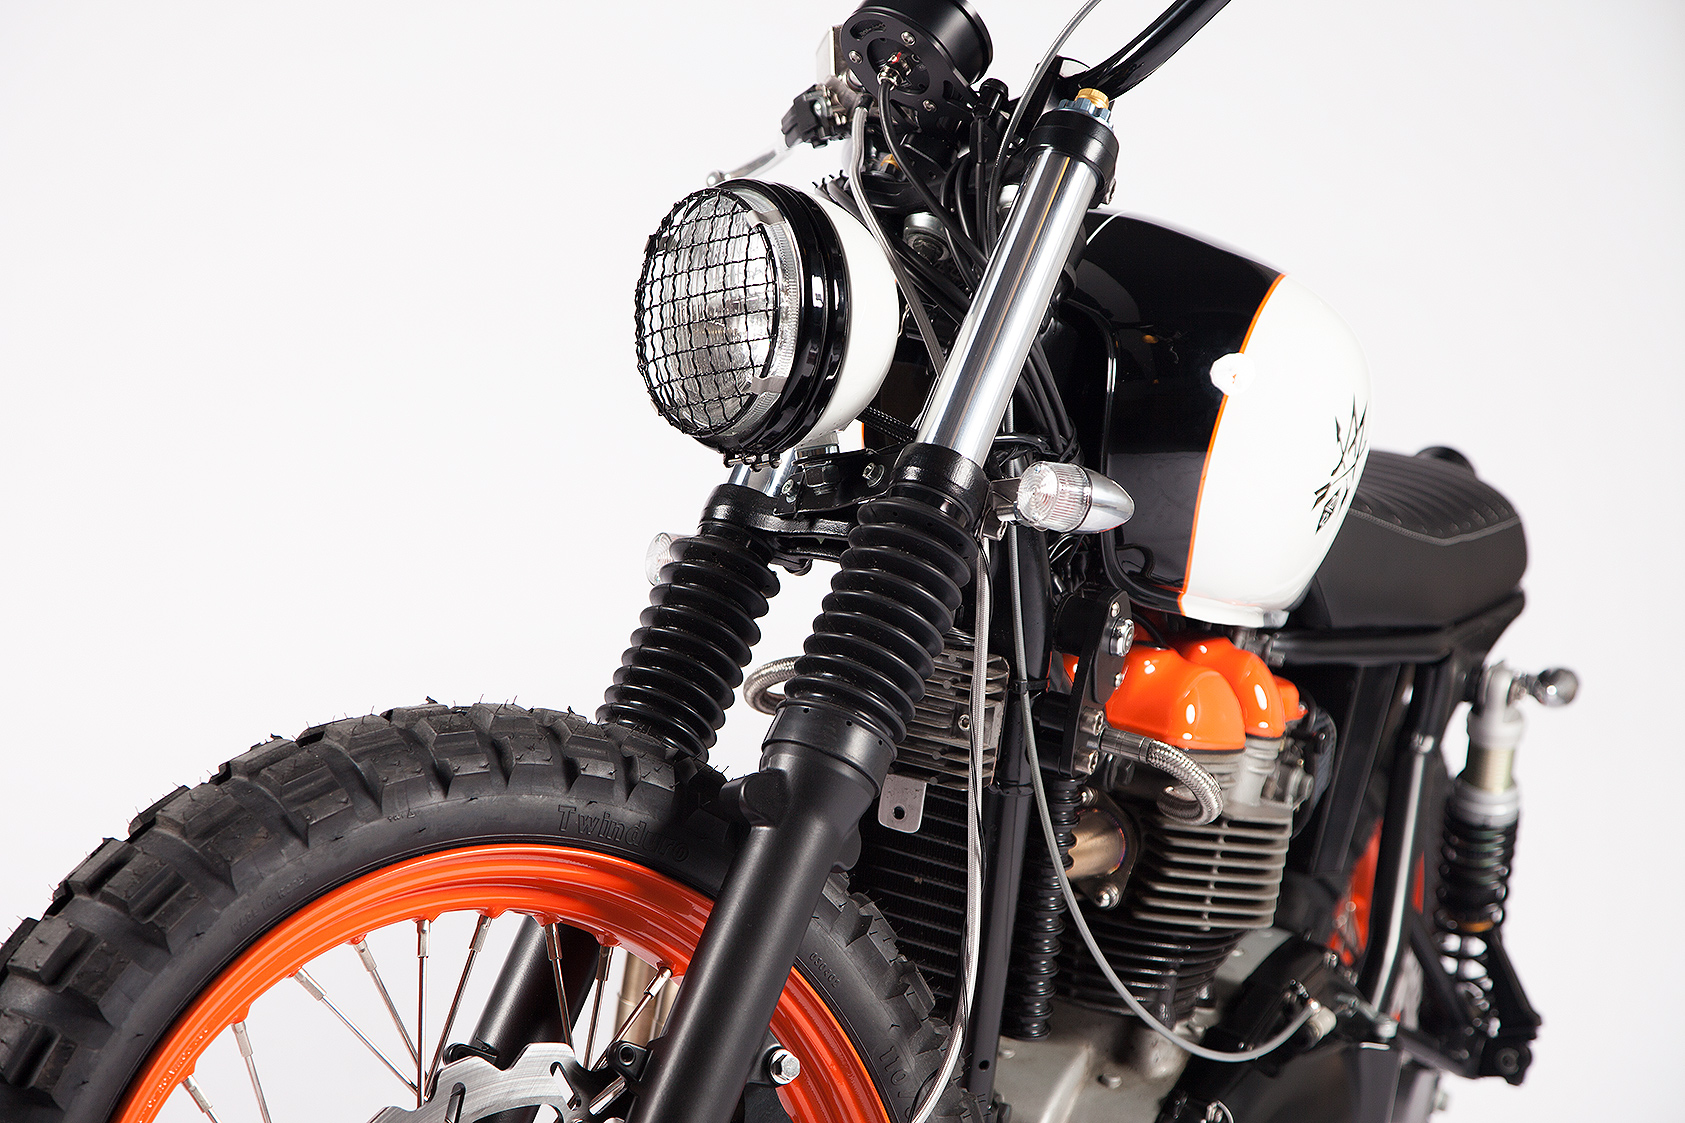 maria_motorcycles_triumph_bonneville_julijana_7692